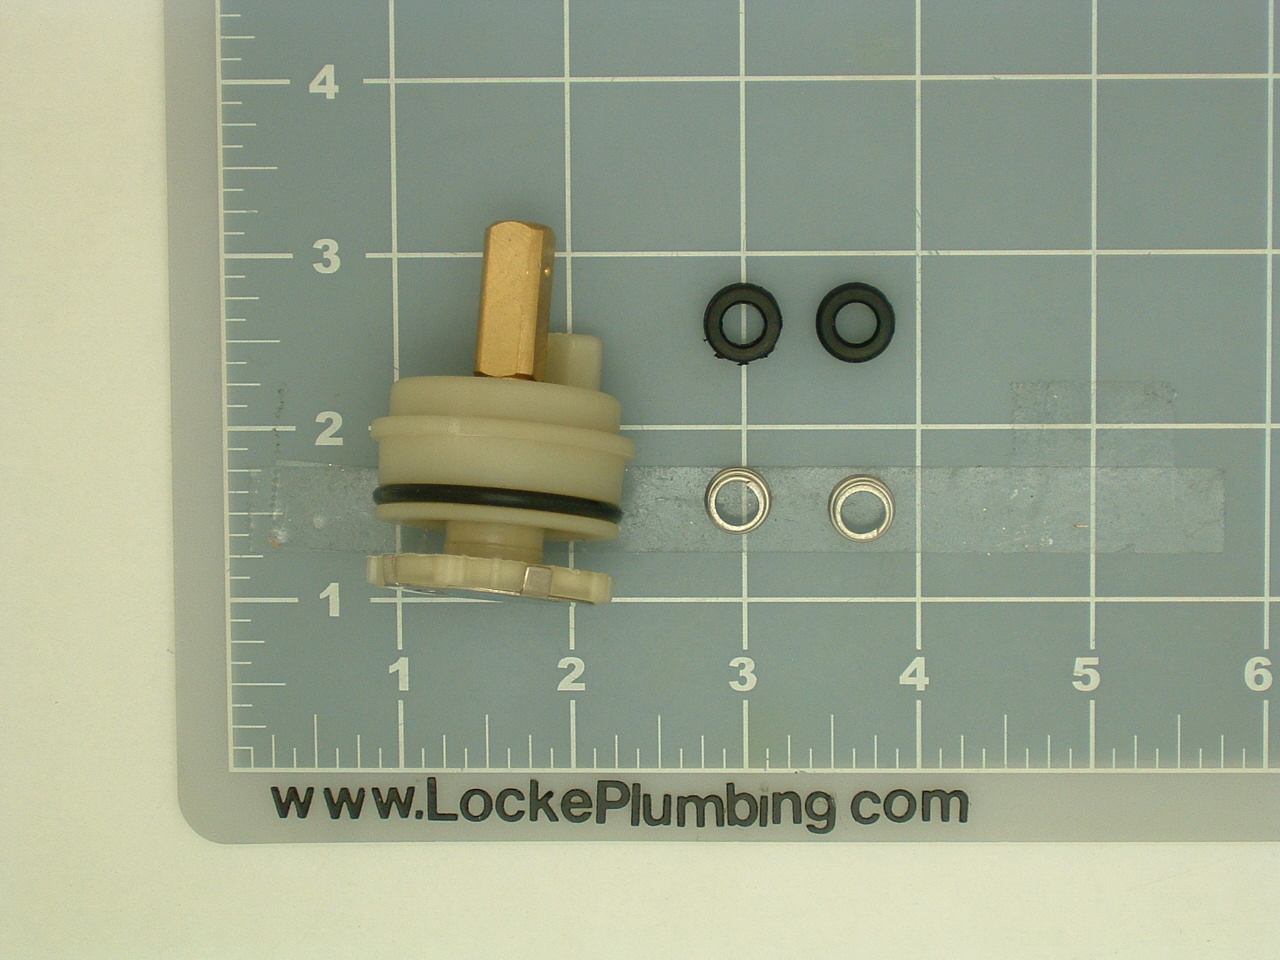 Glacier Bay 603566 Single Lever Cartridge Locke Plumbing